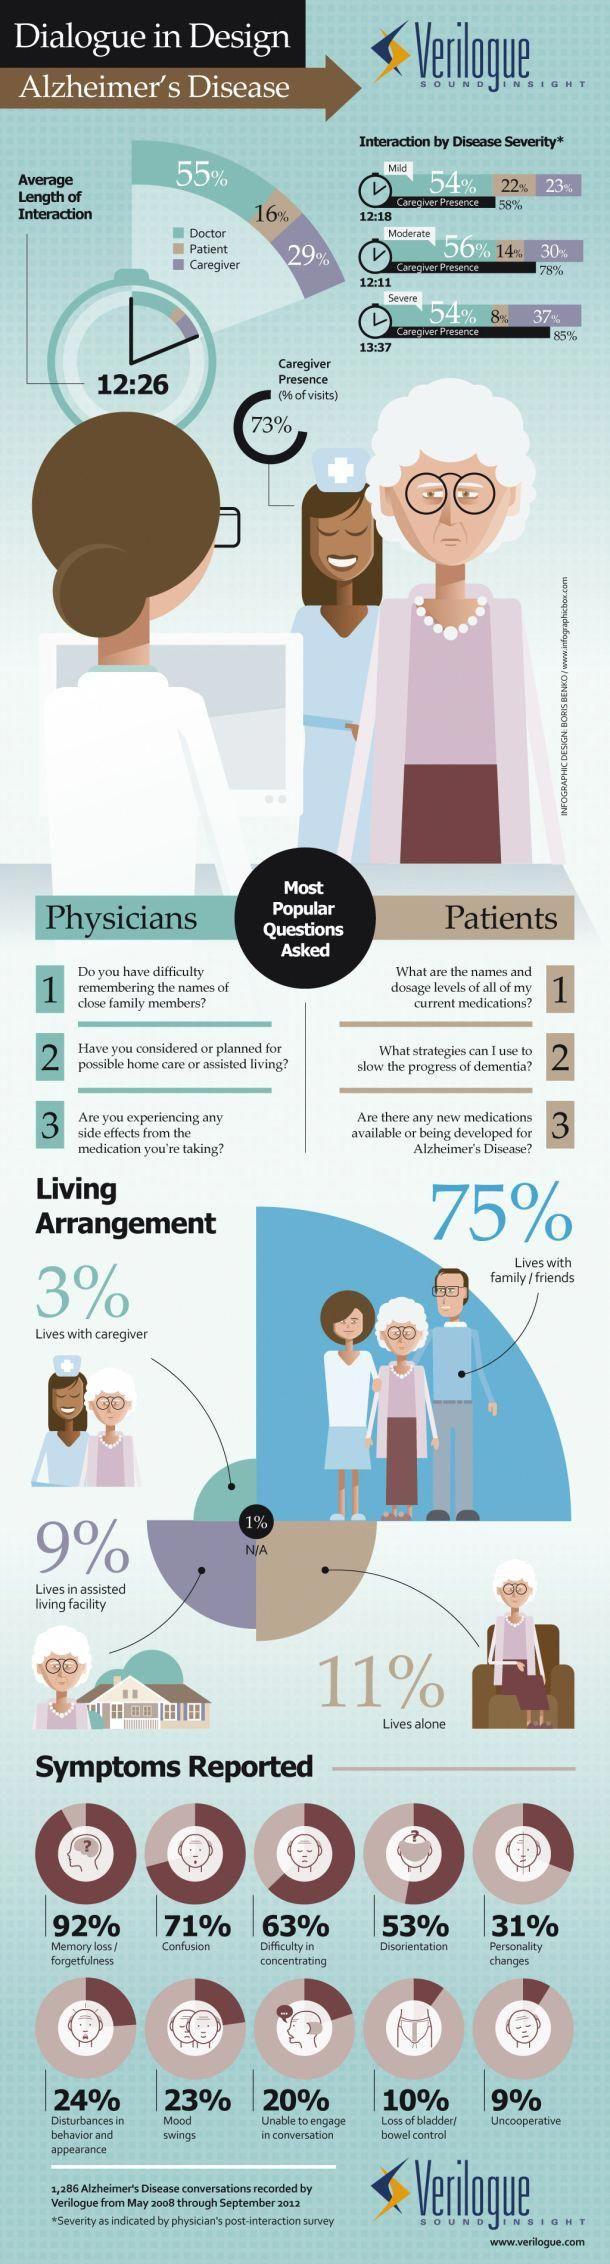 Dialogue in Design: Alzheimer's Disease [INFOGRAPHIC] #elderlycarealzheimers